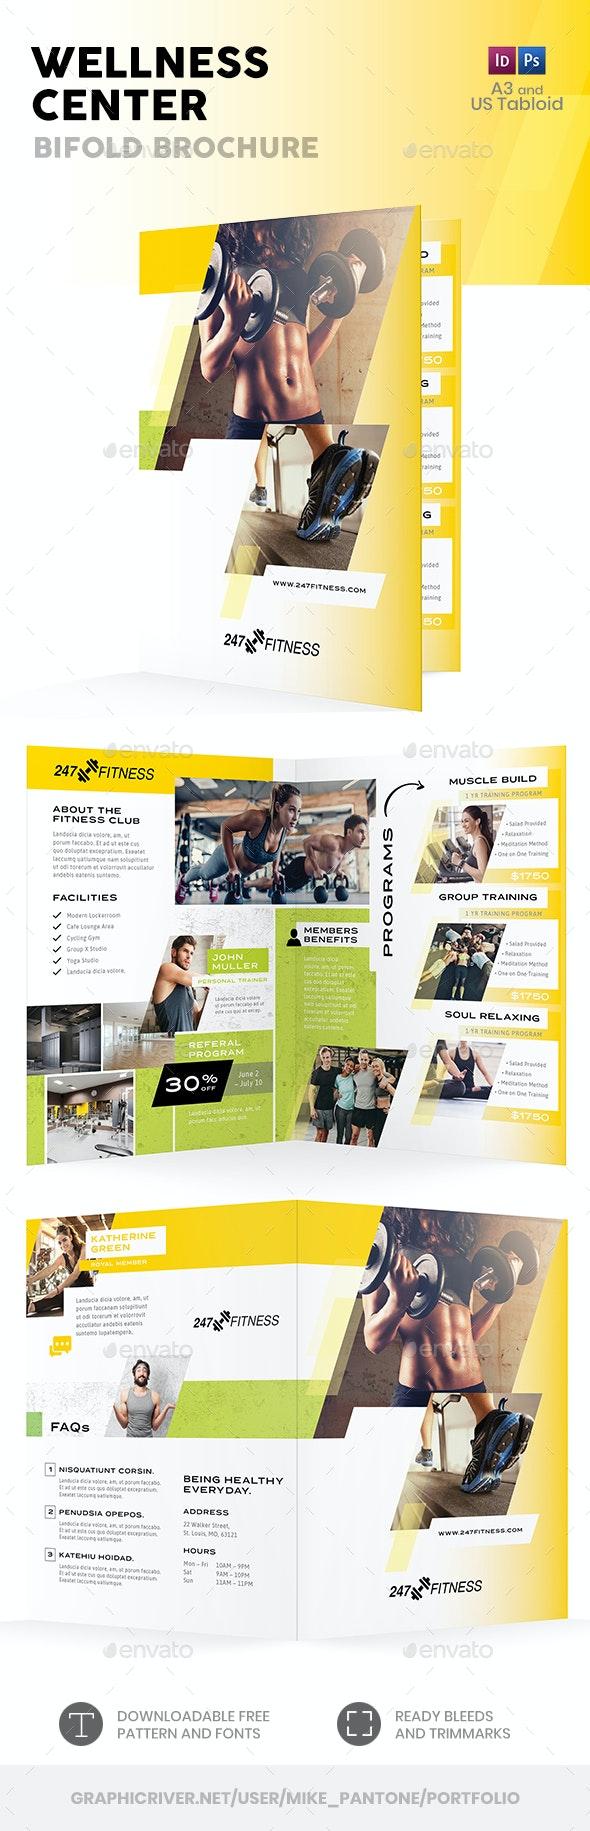 Wellness Center Bifold / Halffold Brochure 3 - Informational Brochures